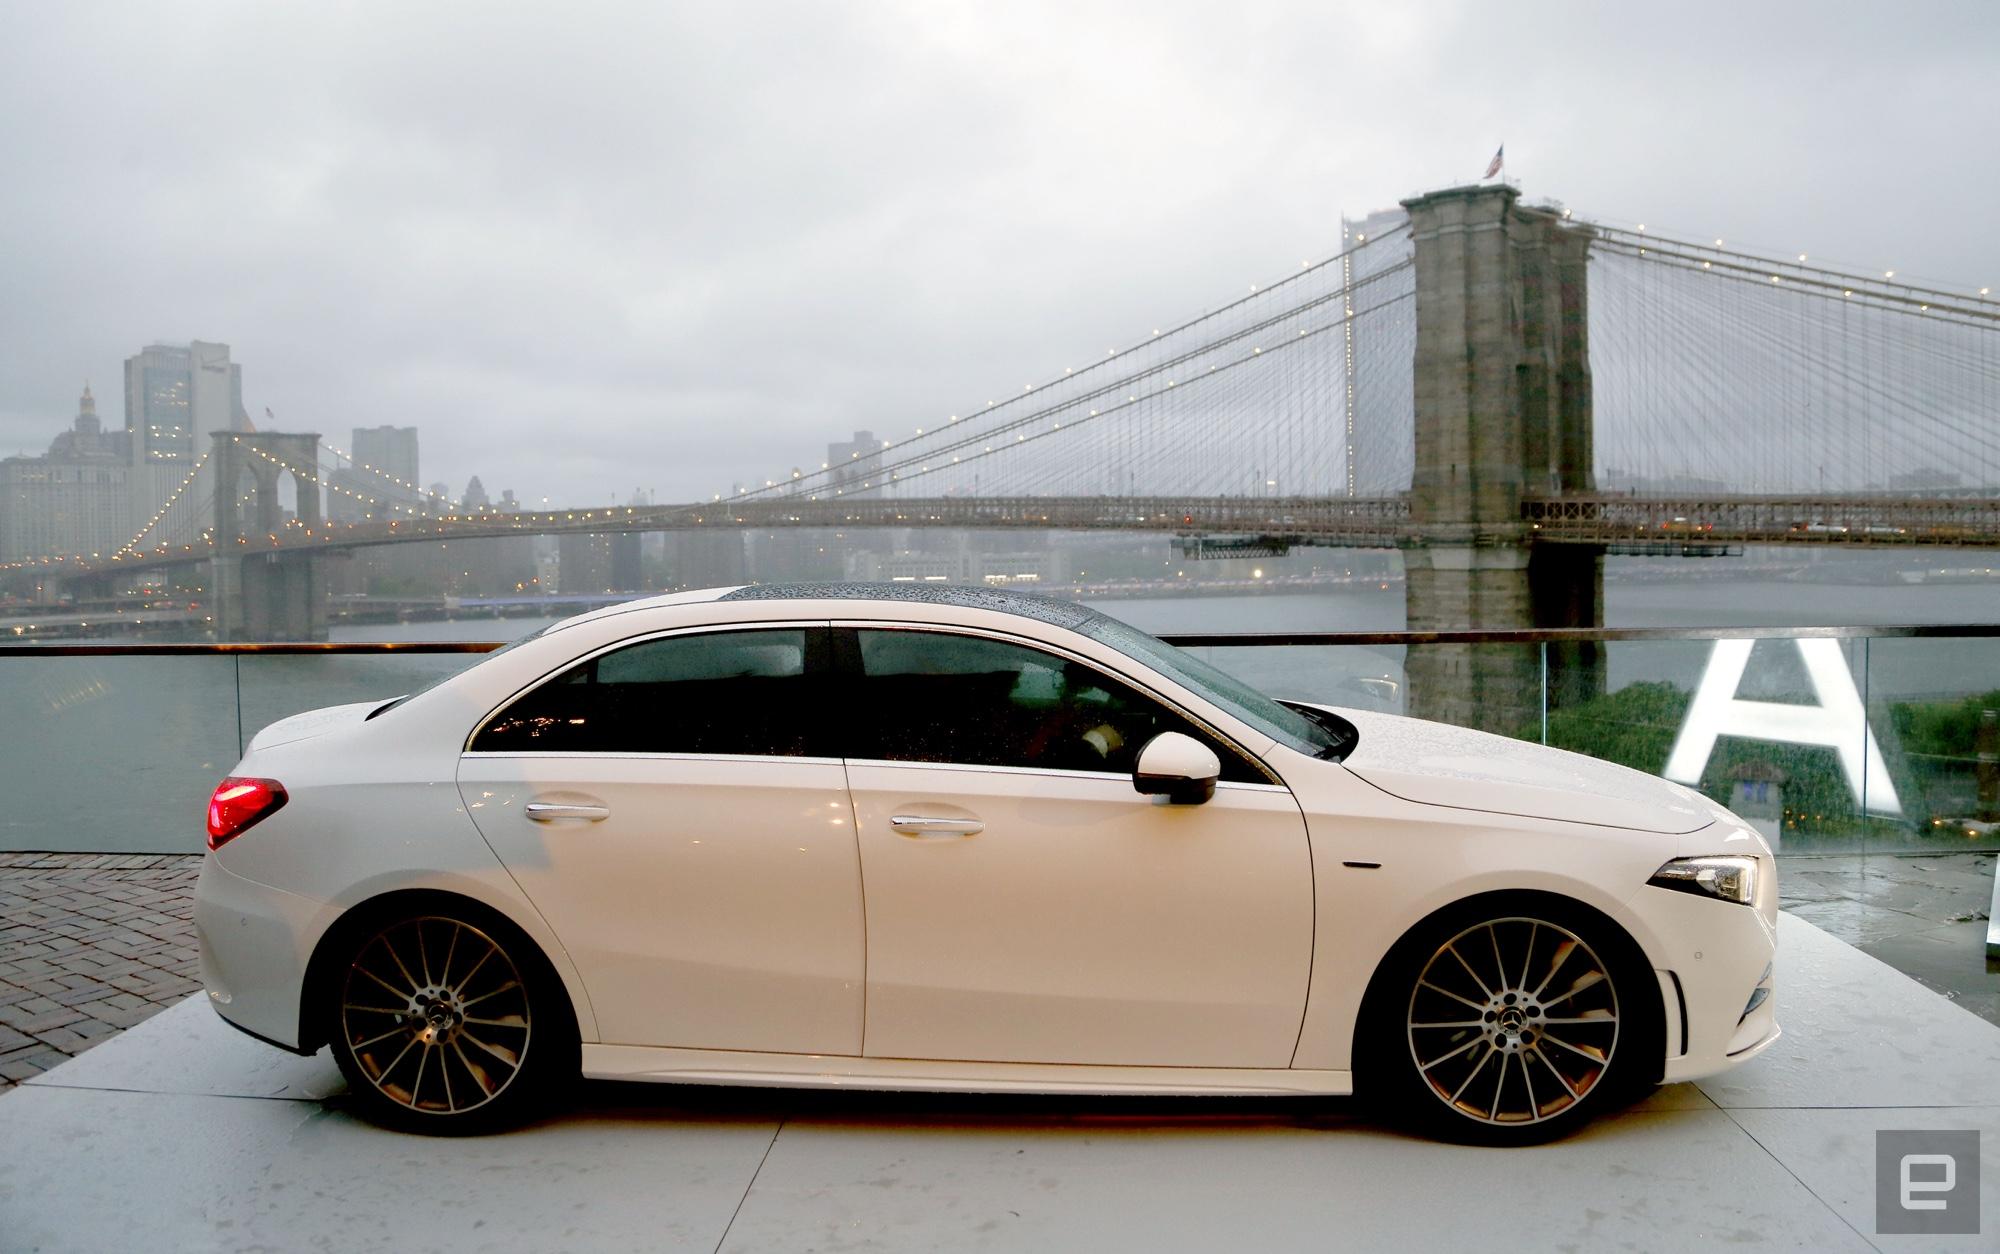 Mercedes\' new, affordable A-Class sedan is as smart as it is sleek